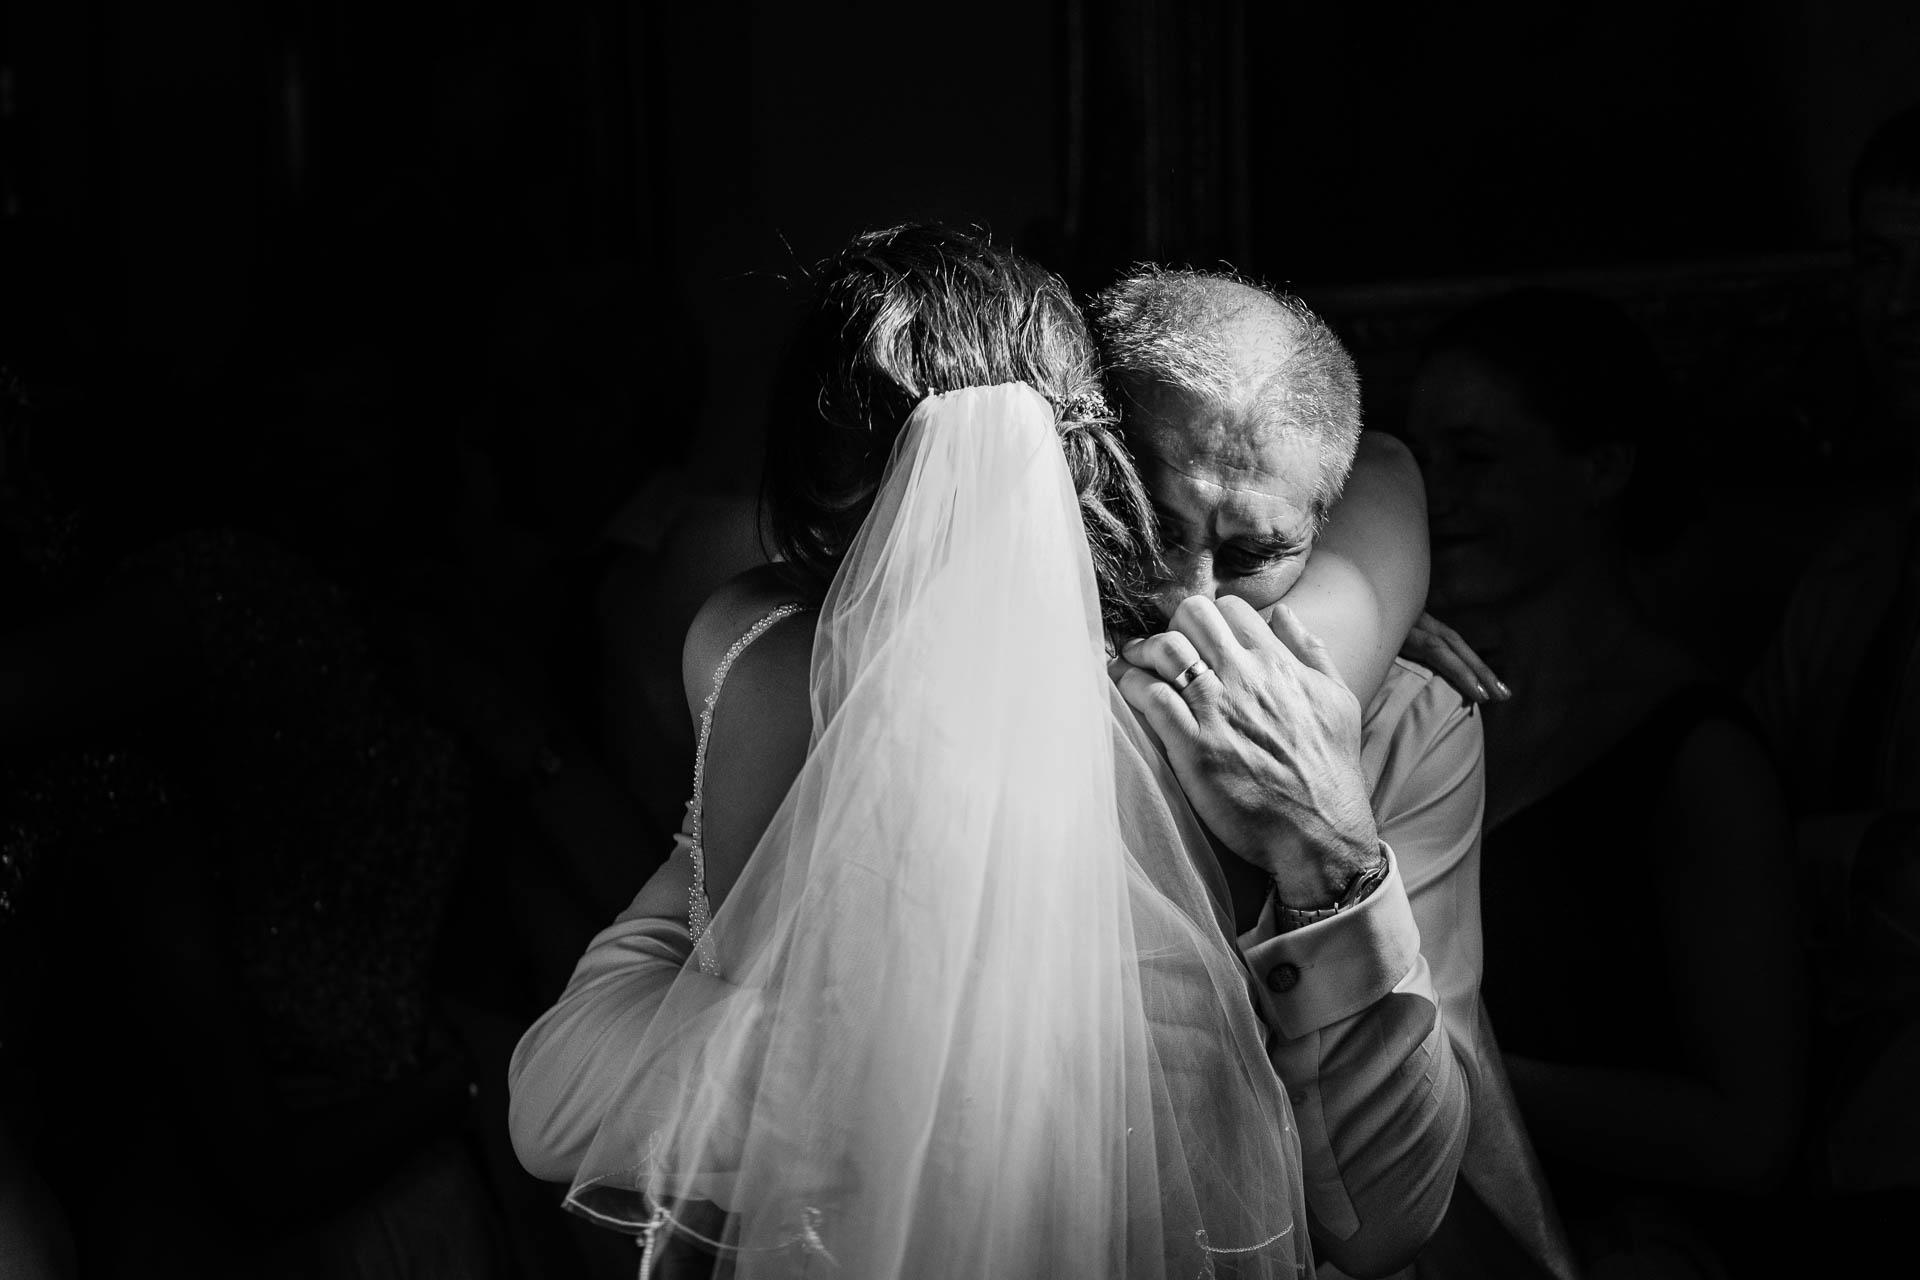 orchardleigh house wedding - Danni & Barney (504).jpg